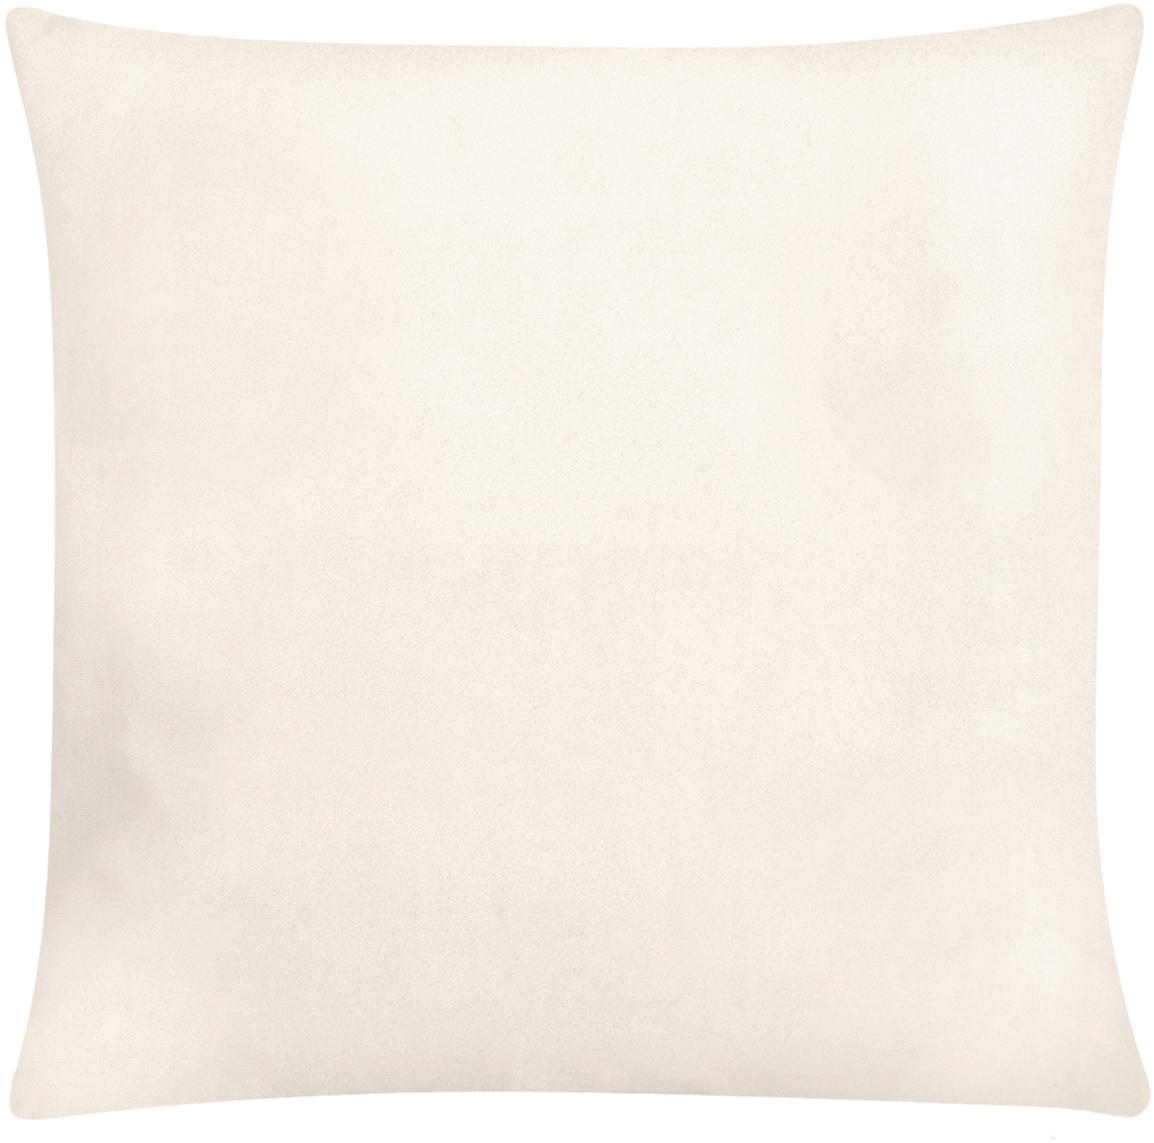 Funda de cojín bordada de terciopelo brillante Palmsprings, 100%terciopelo de poliéster, Blanco crema, dorado, An 40 x L 40 cm